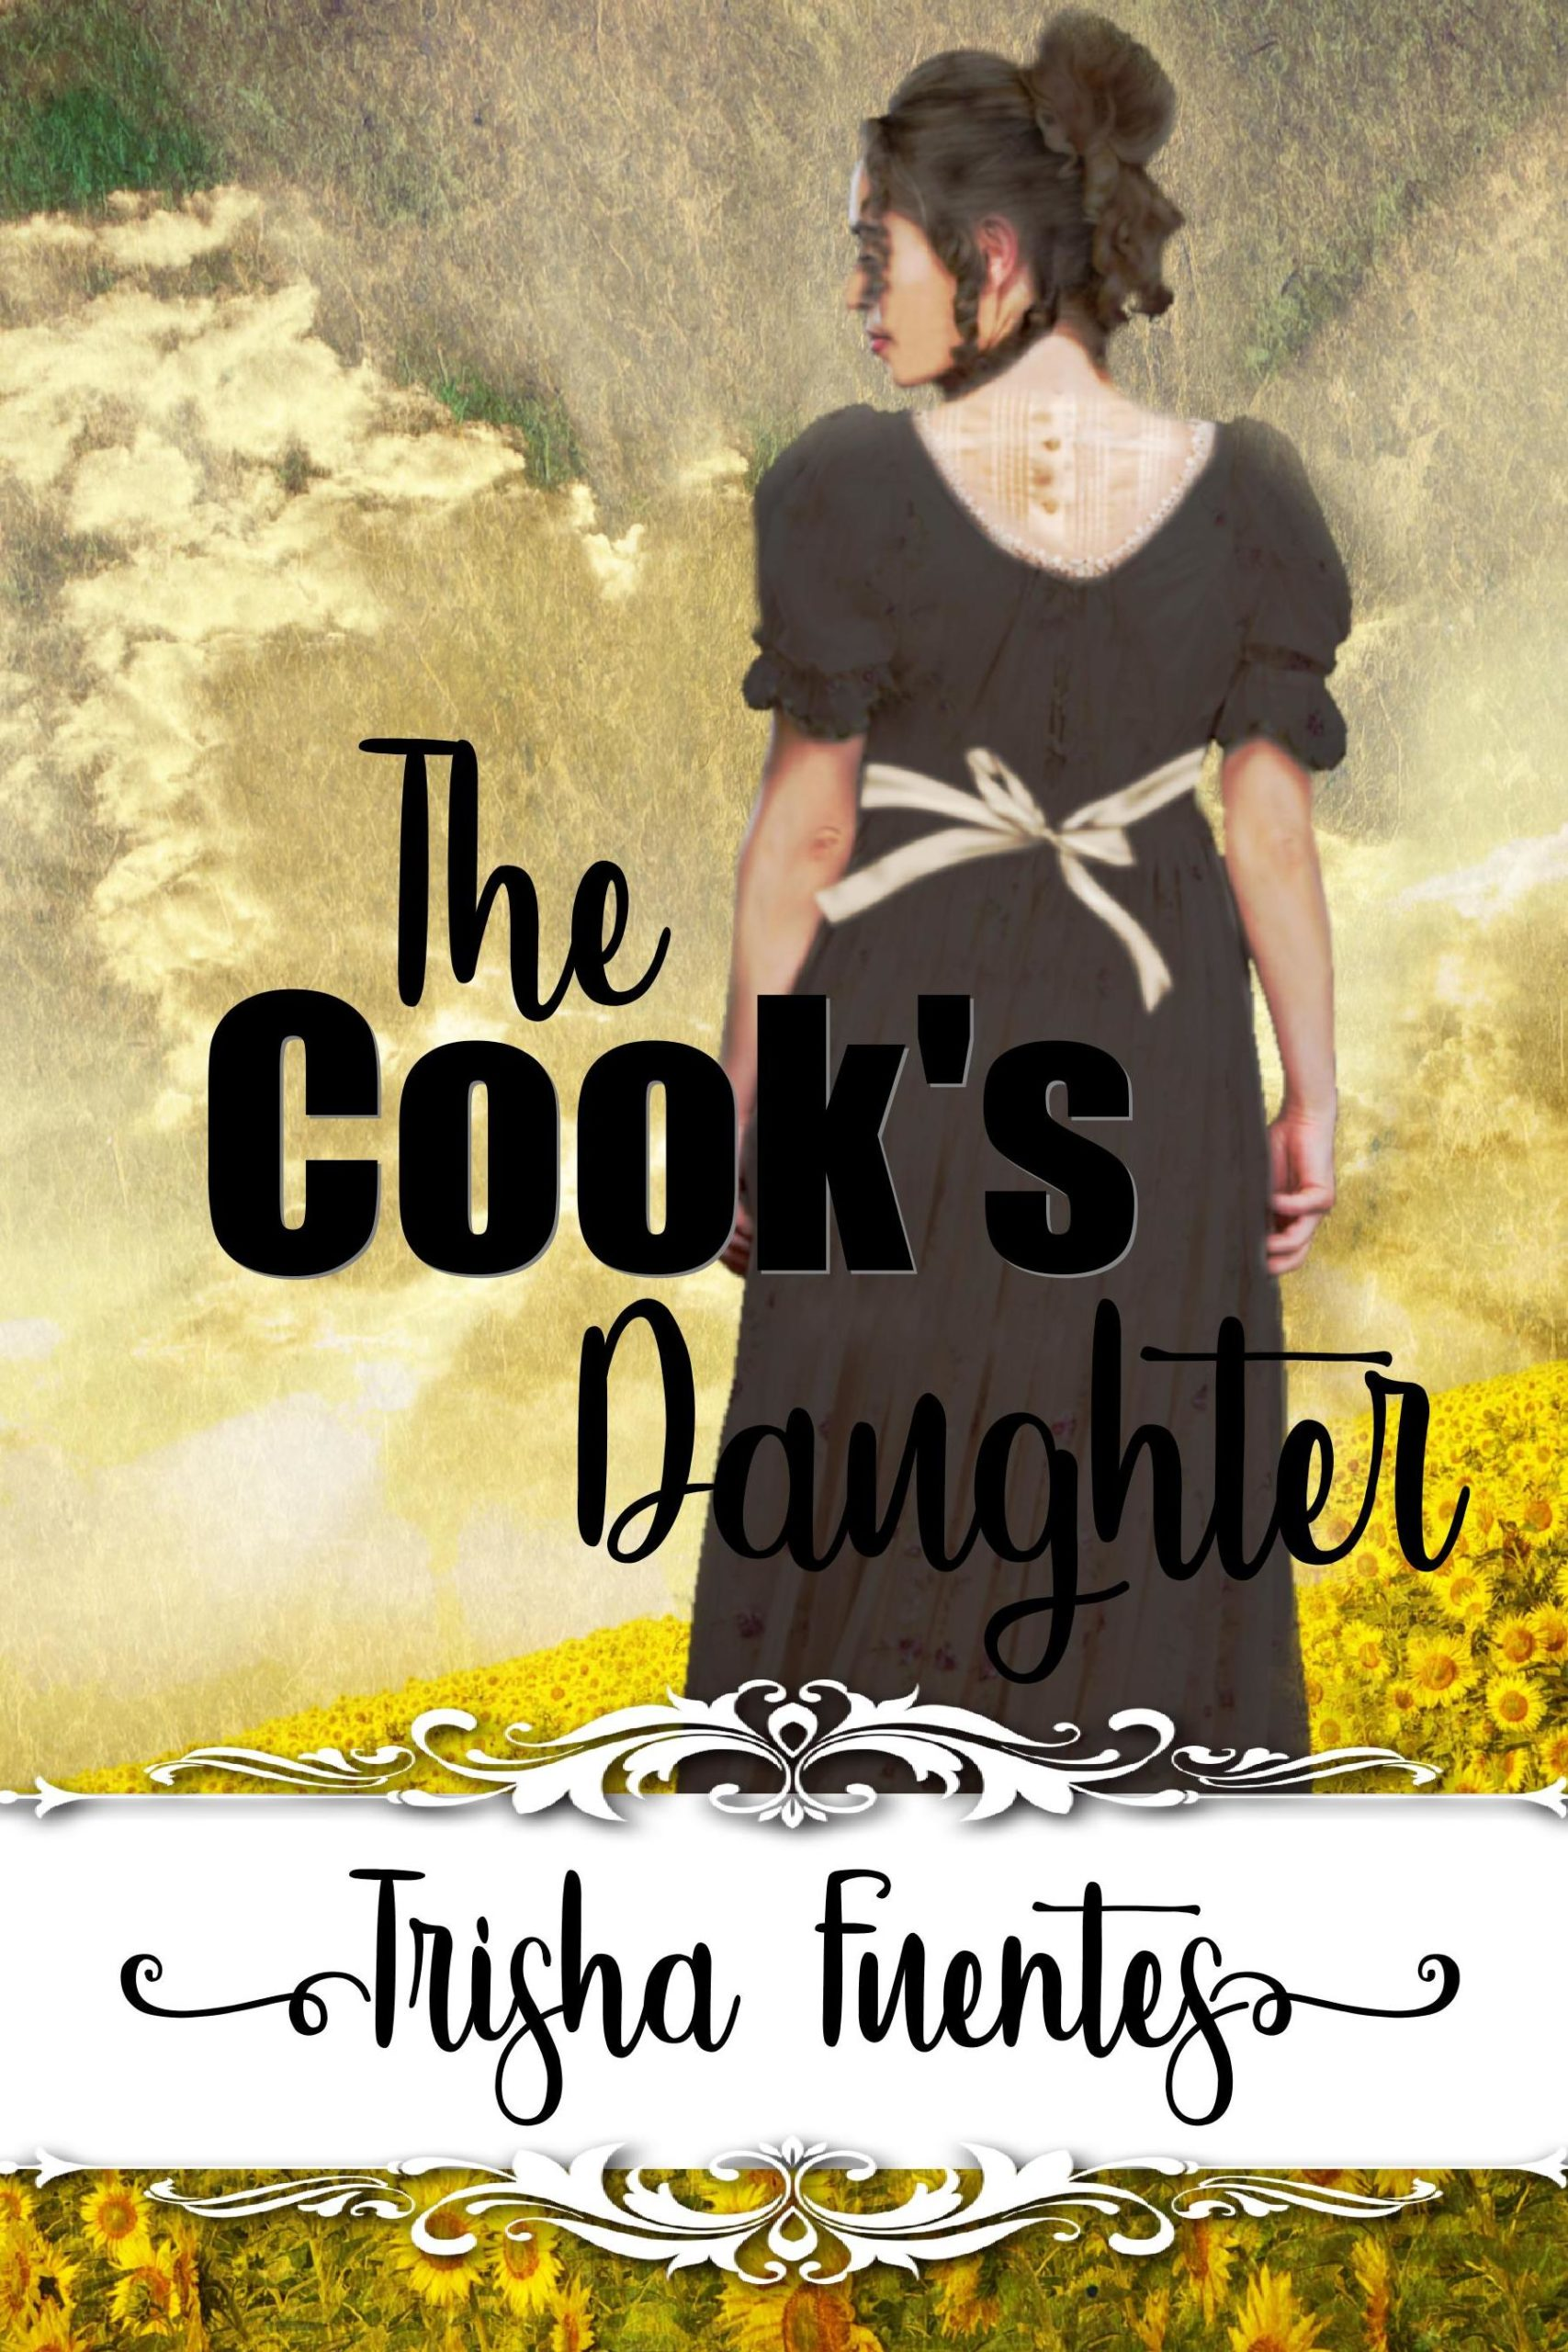 "<span itemprop=""name"">The Cook's Daughter</span>"